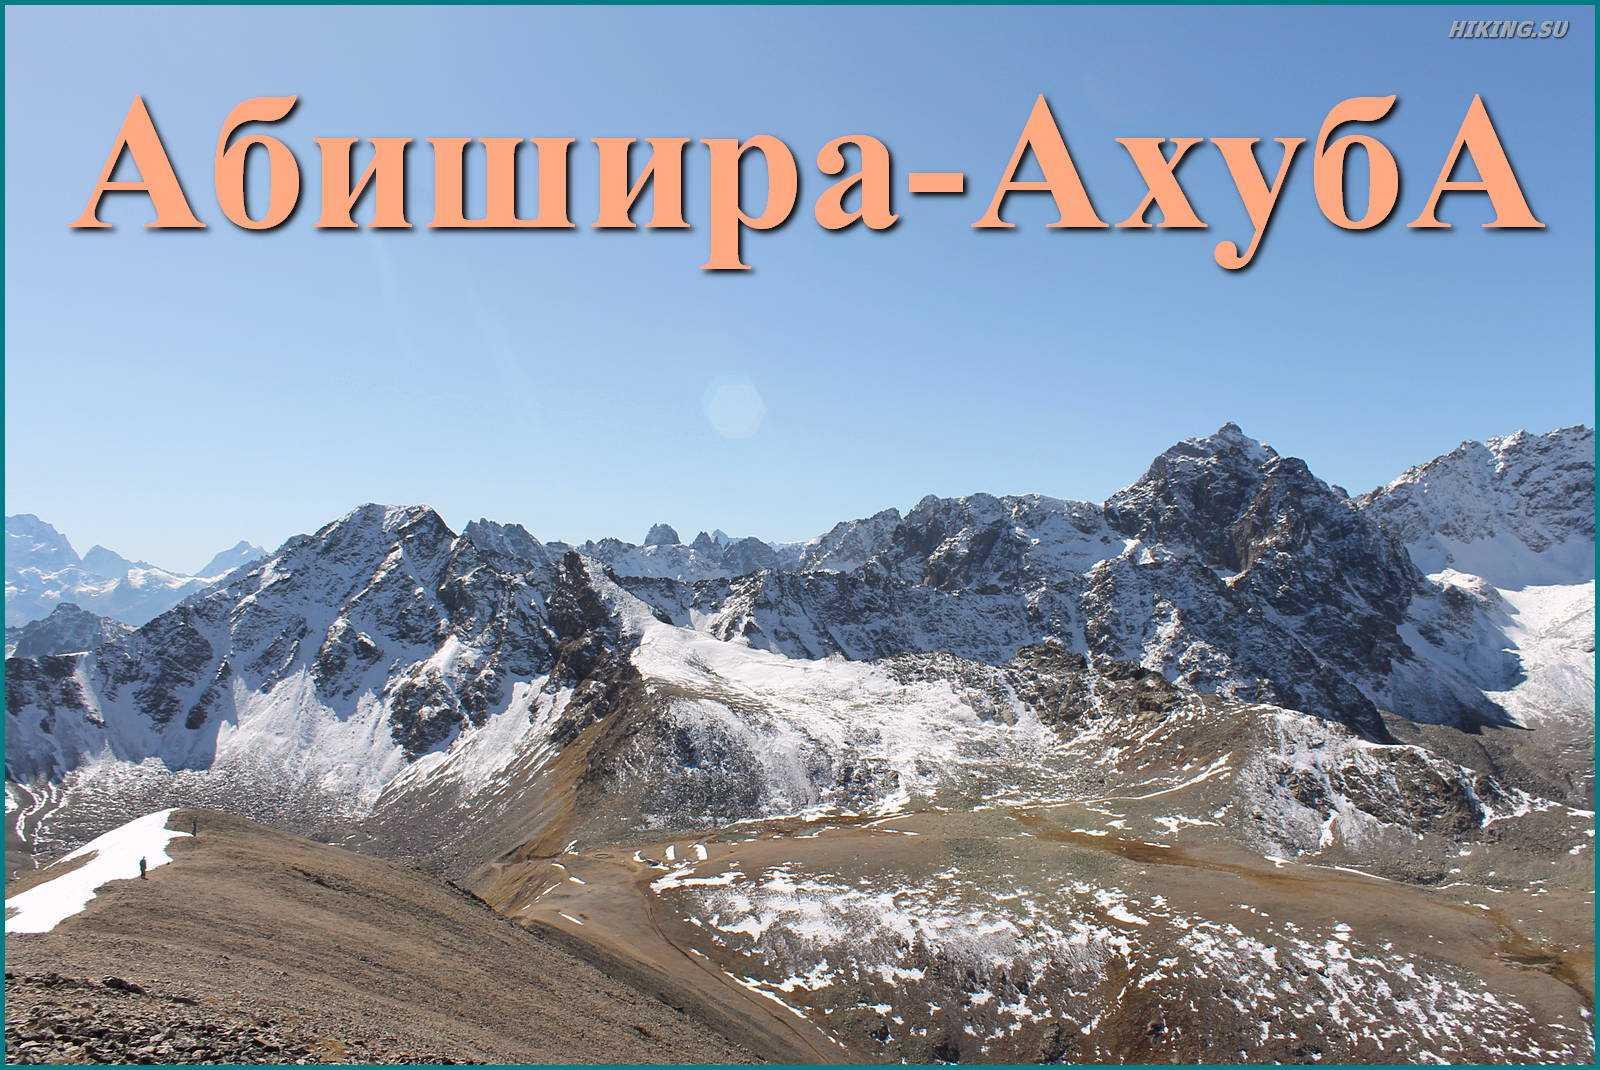 Абишира-Ахуба в 2020 году